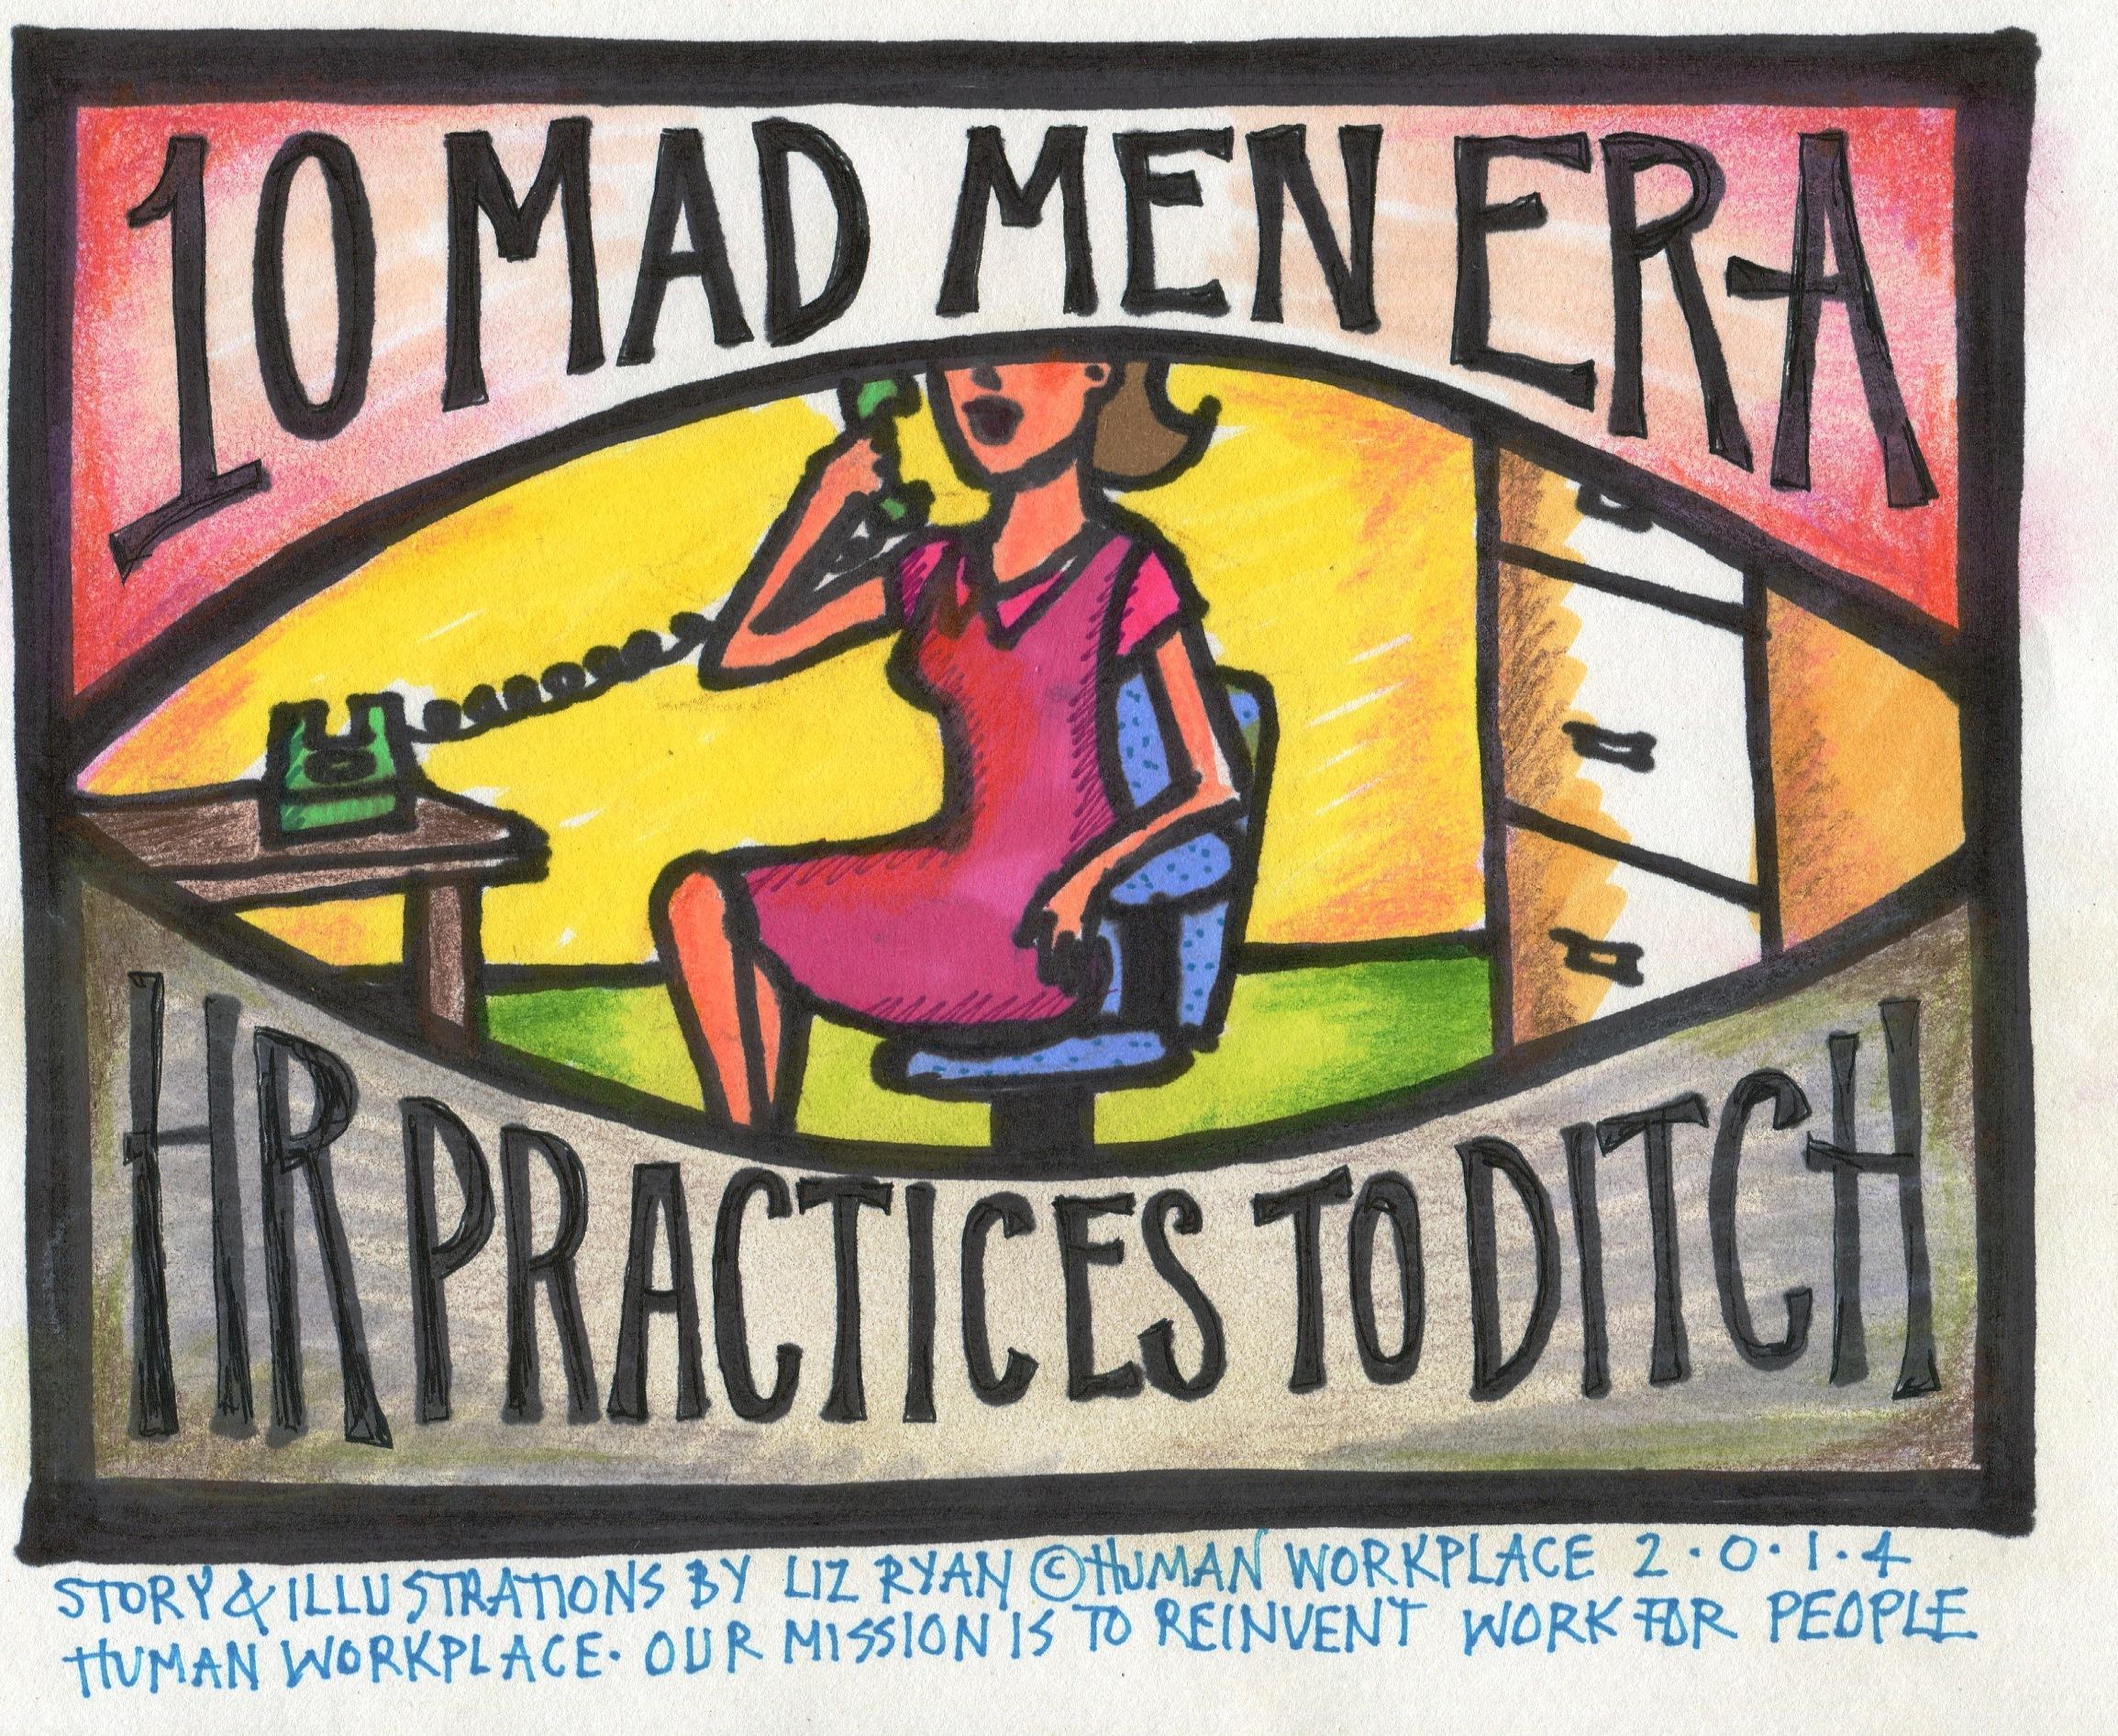 Ten Mad Men-Era HR Practices To Ditch In 2014